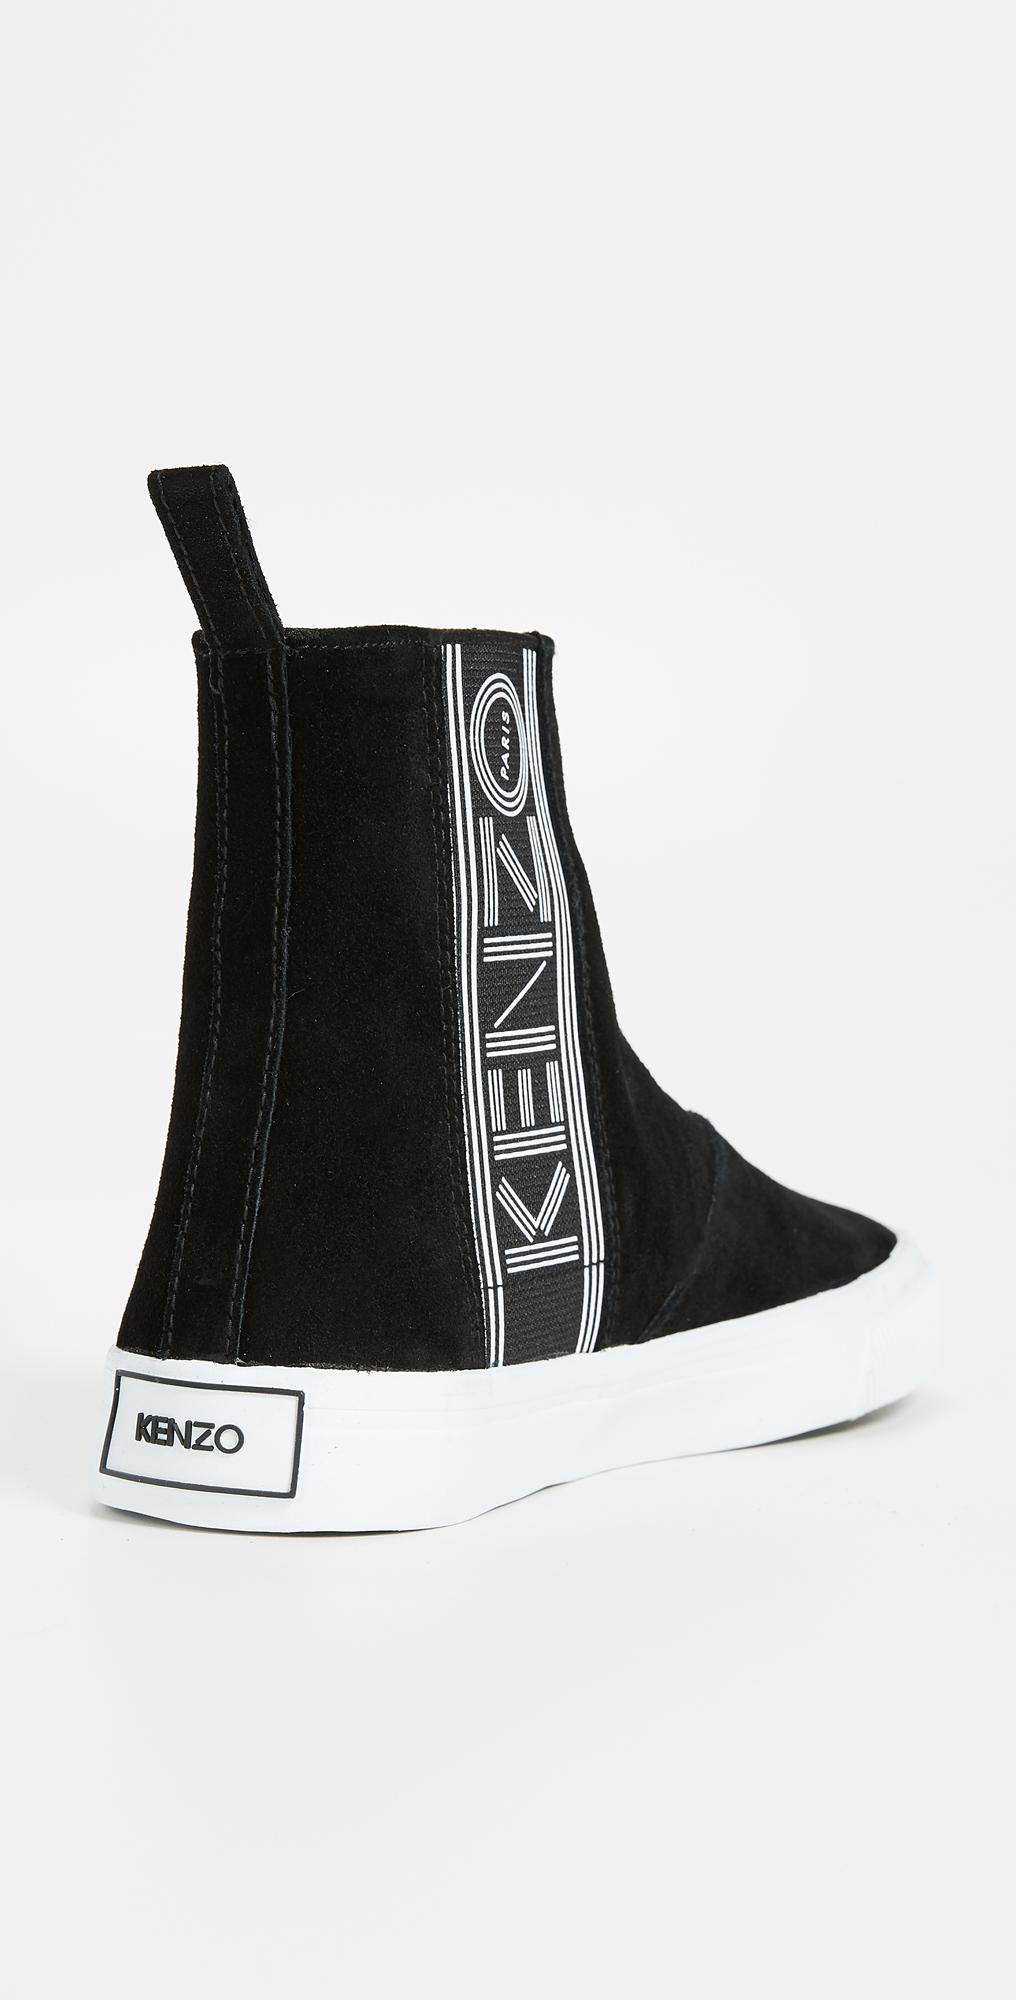 KENZO Kapri High Top Sneakers   SHOPBOP